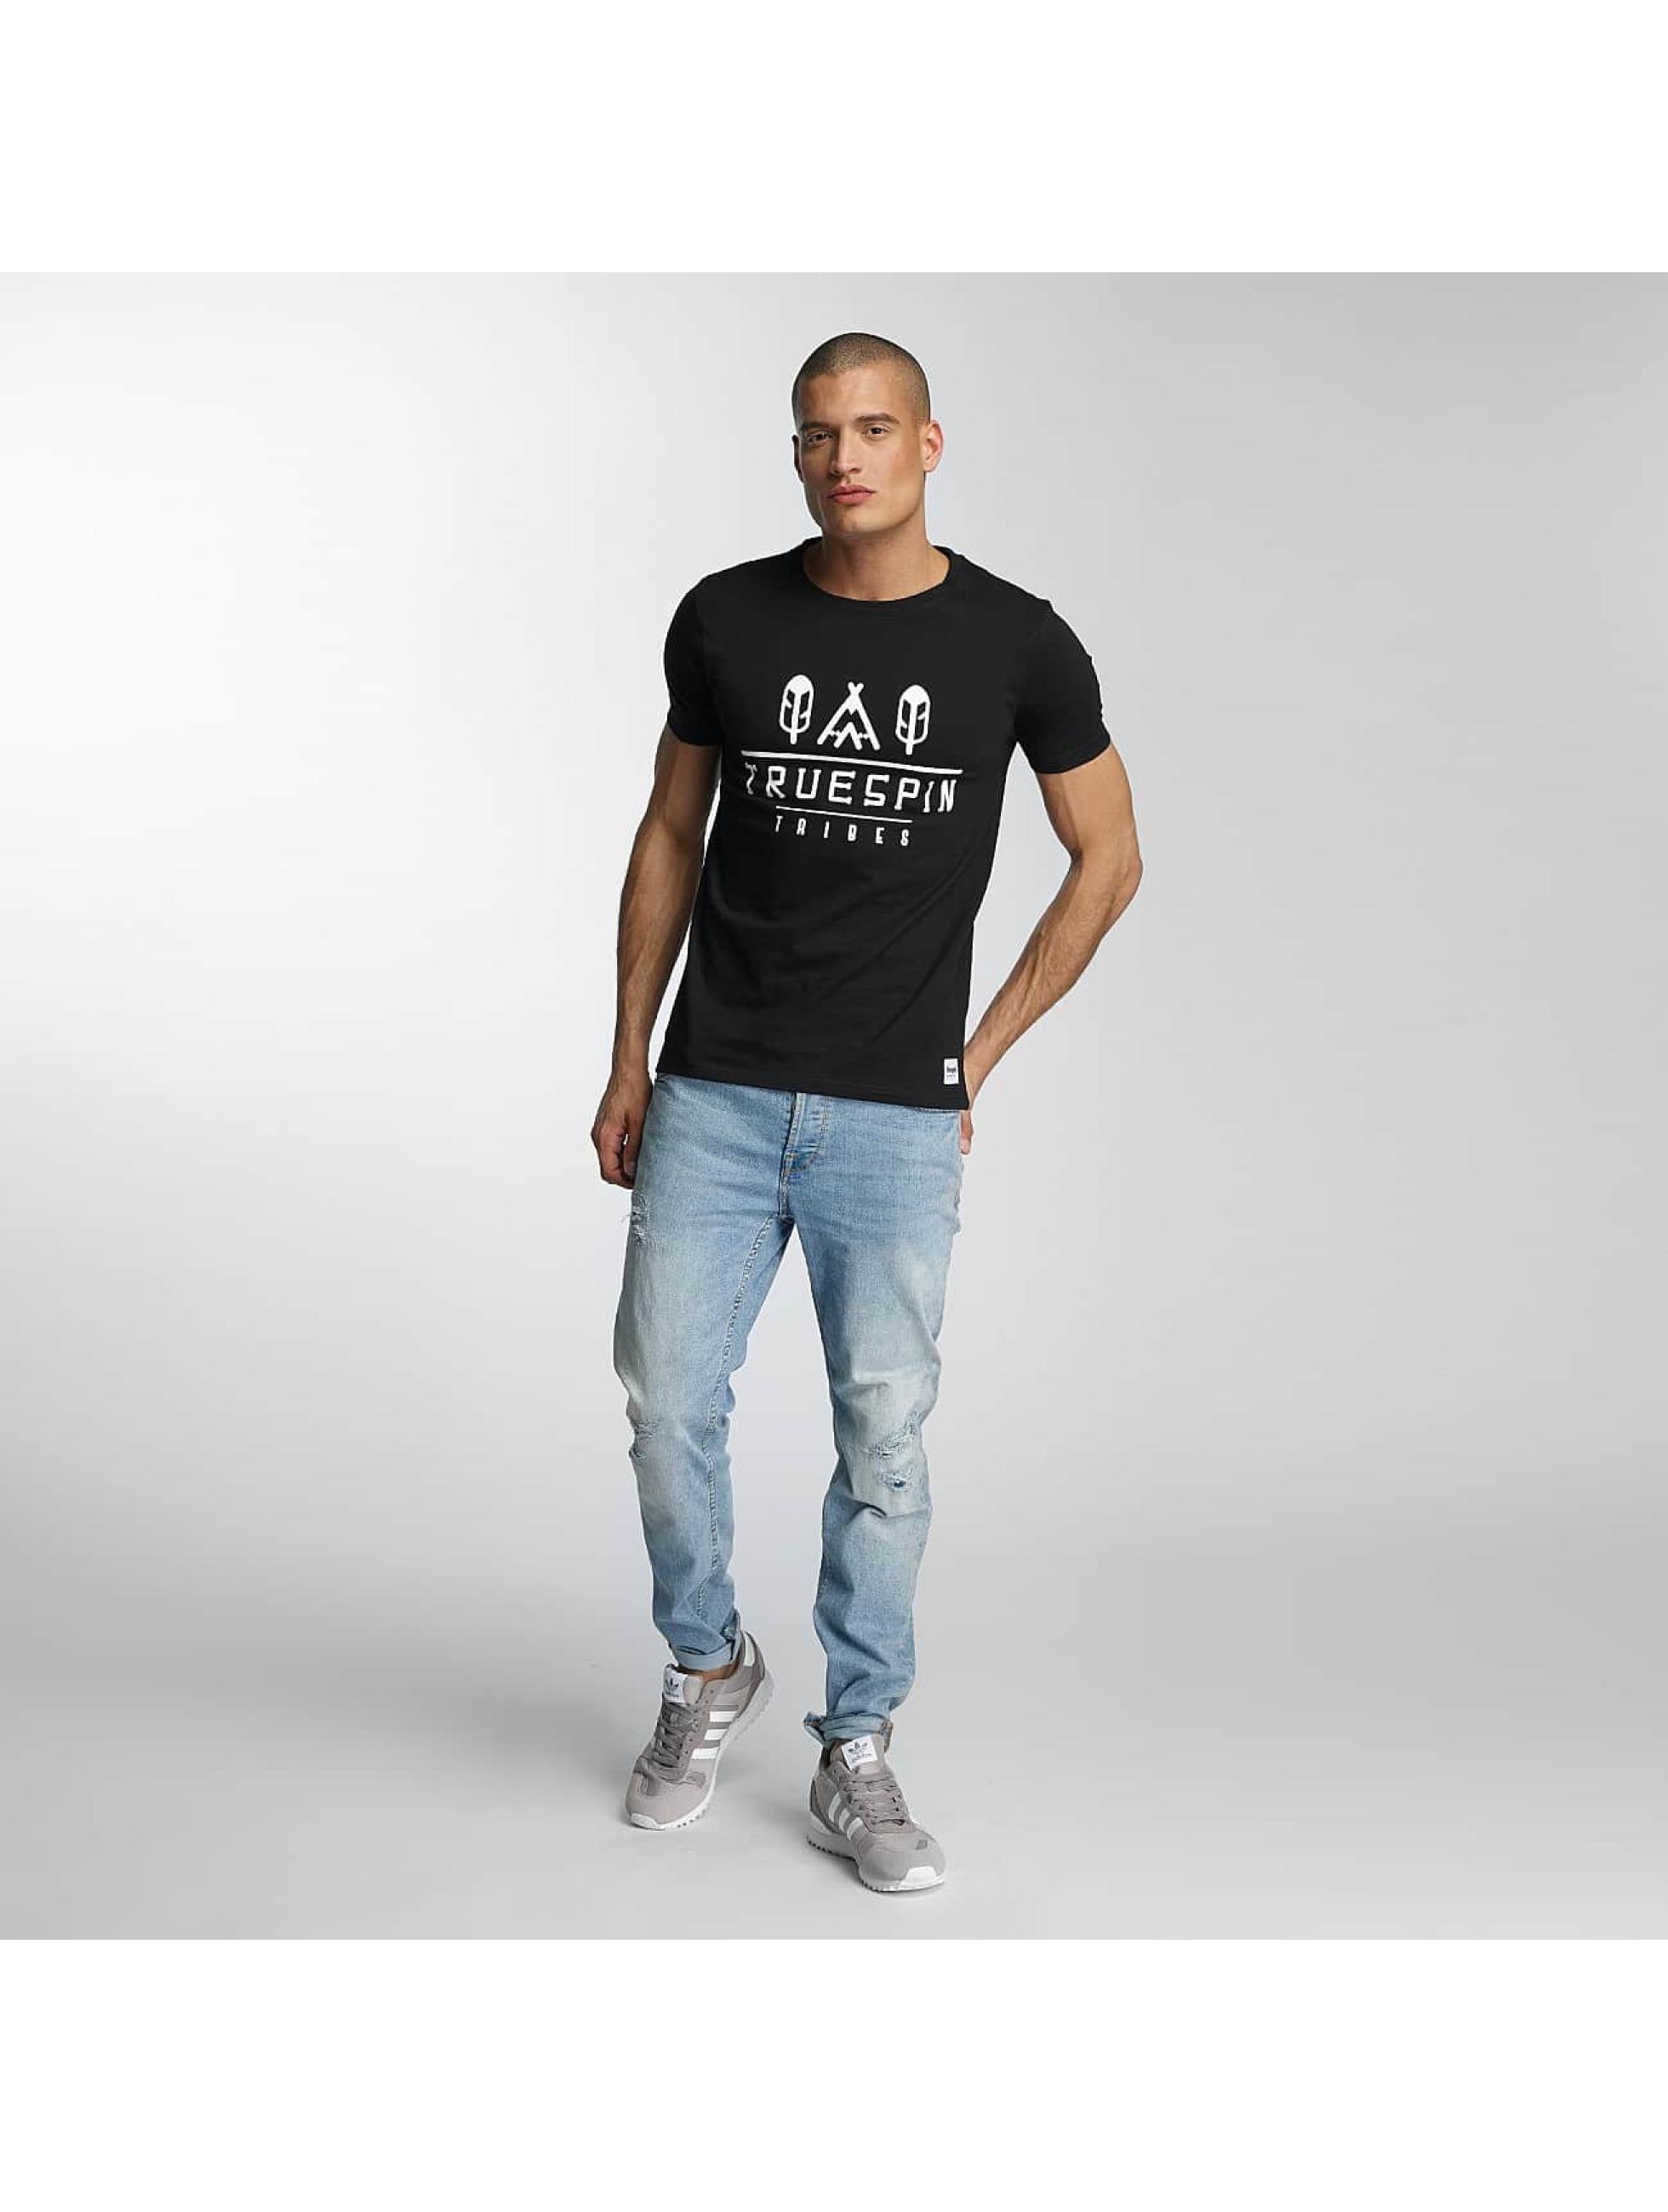 TrueSpin Camiseta 8 negro